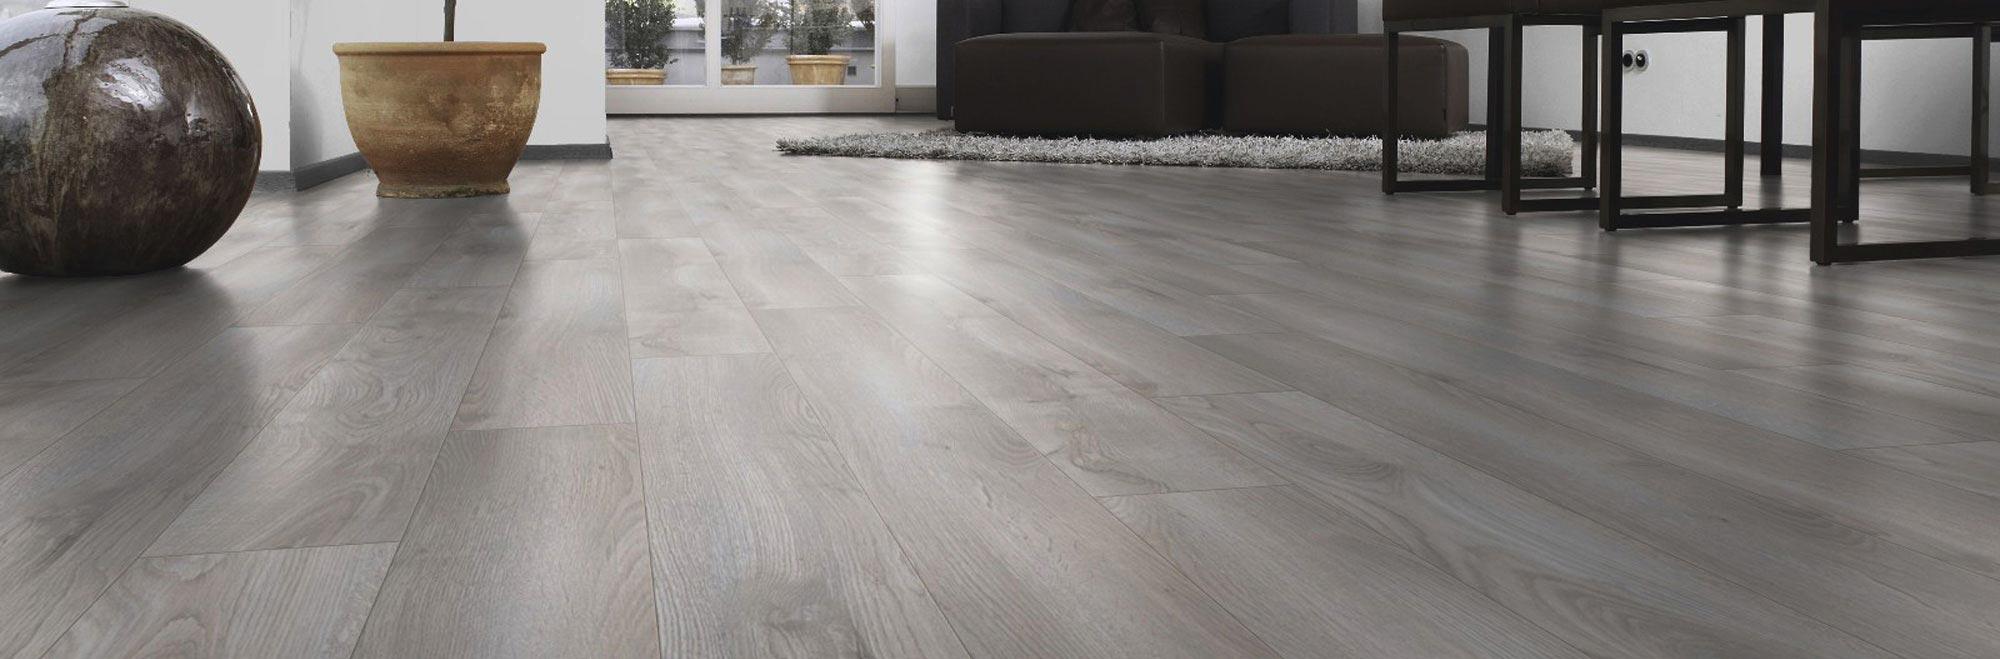 Hardwood Floor Store hardwood flooring stores akiozcom Floor